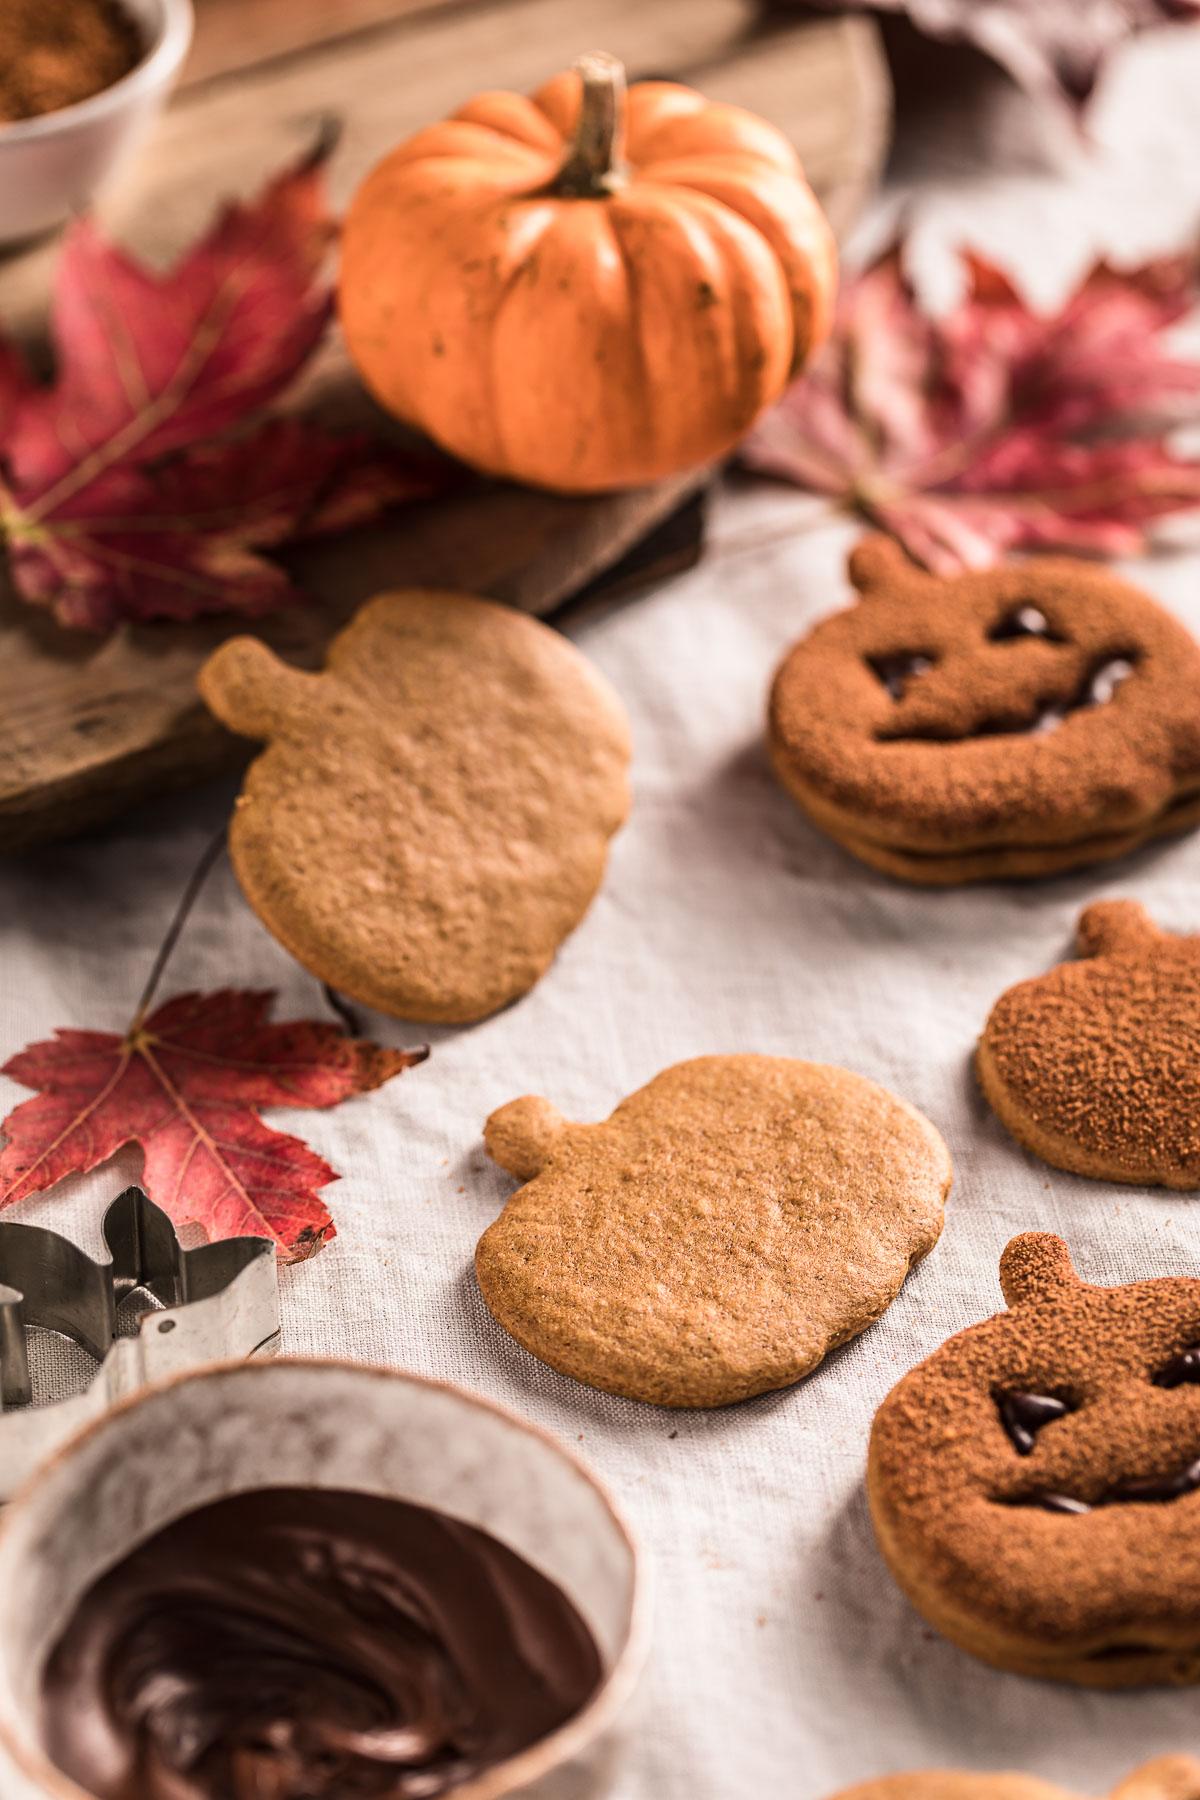 biscotti alla zucca vegan integrali senza uova senza burro ricetta frollini vegan pumpkin cutout cookies recipe cinnamon sugar Halloween cookies